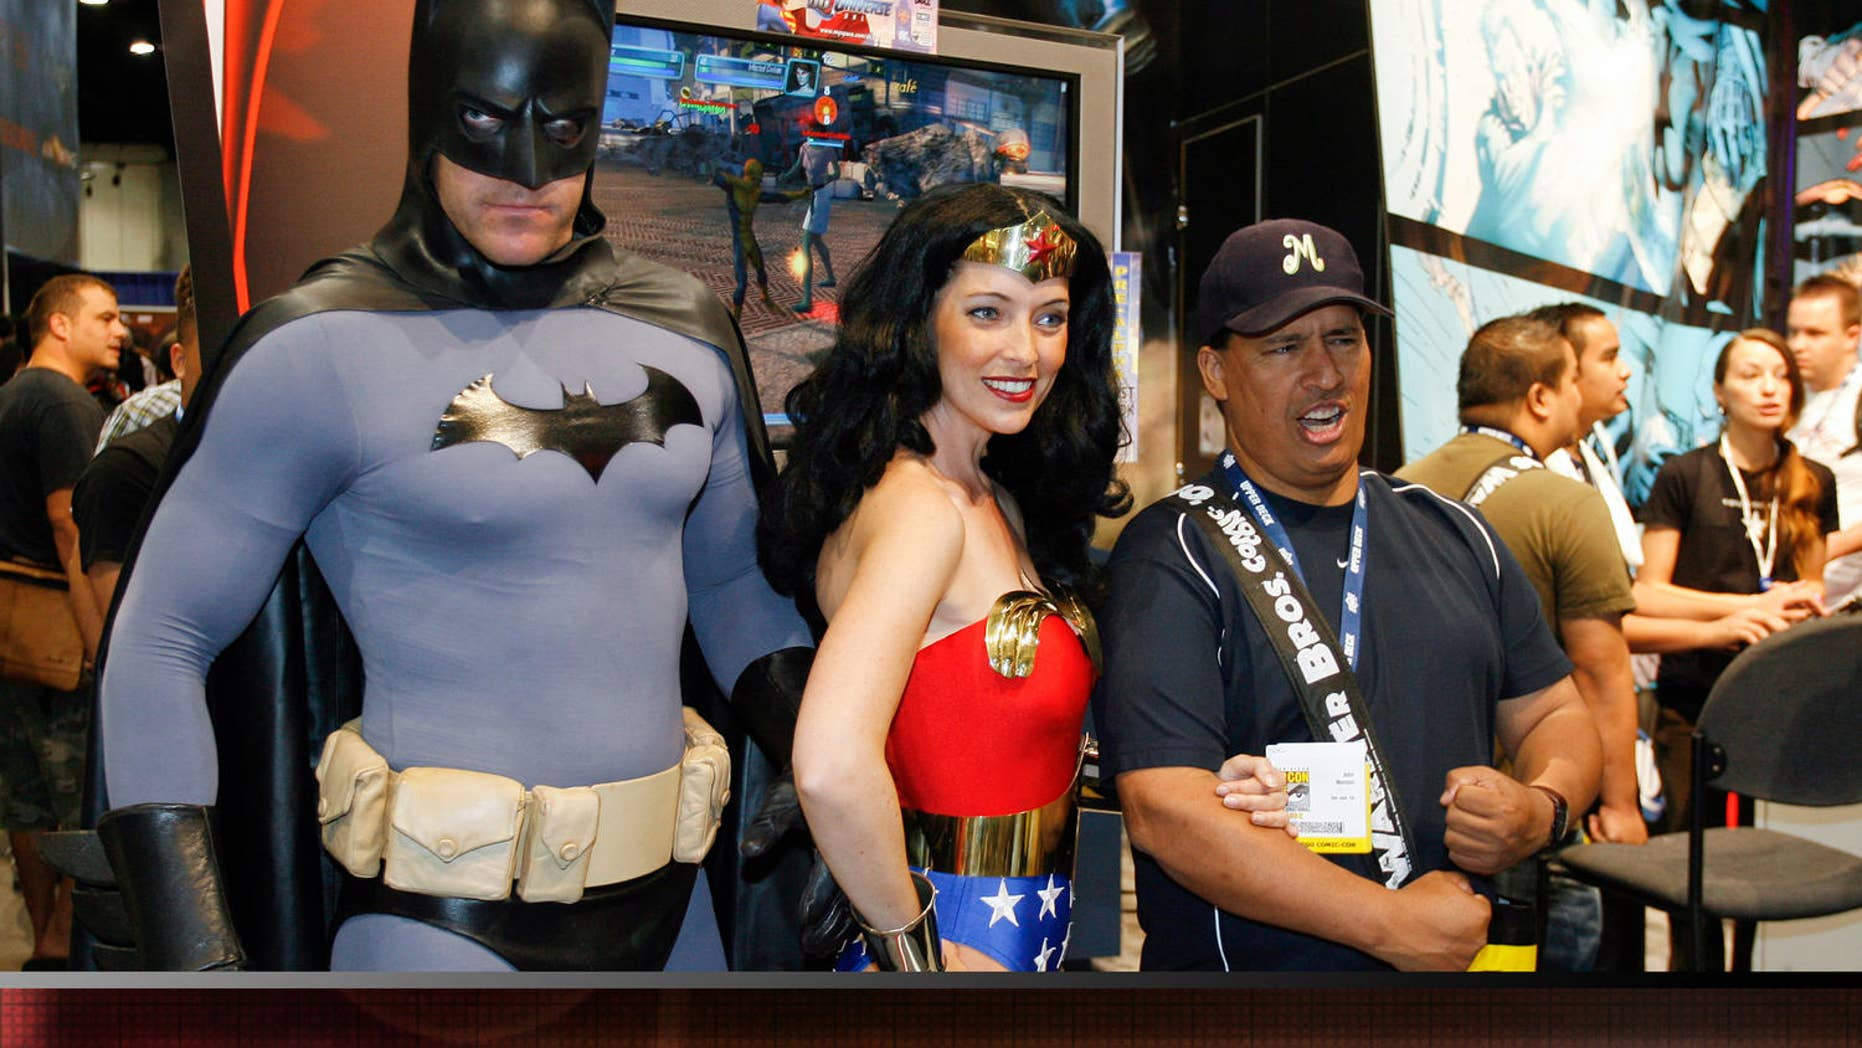 Wonder Woman is still a big draw at big super-hero events like Comic Con.